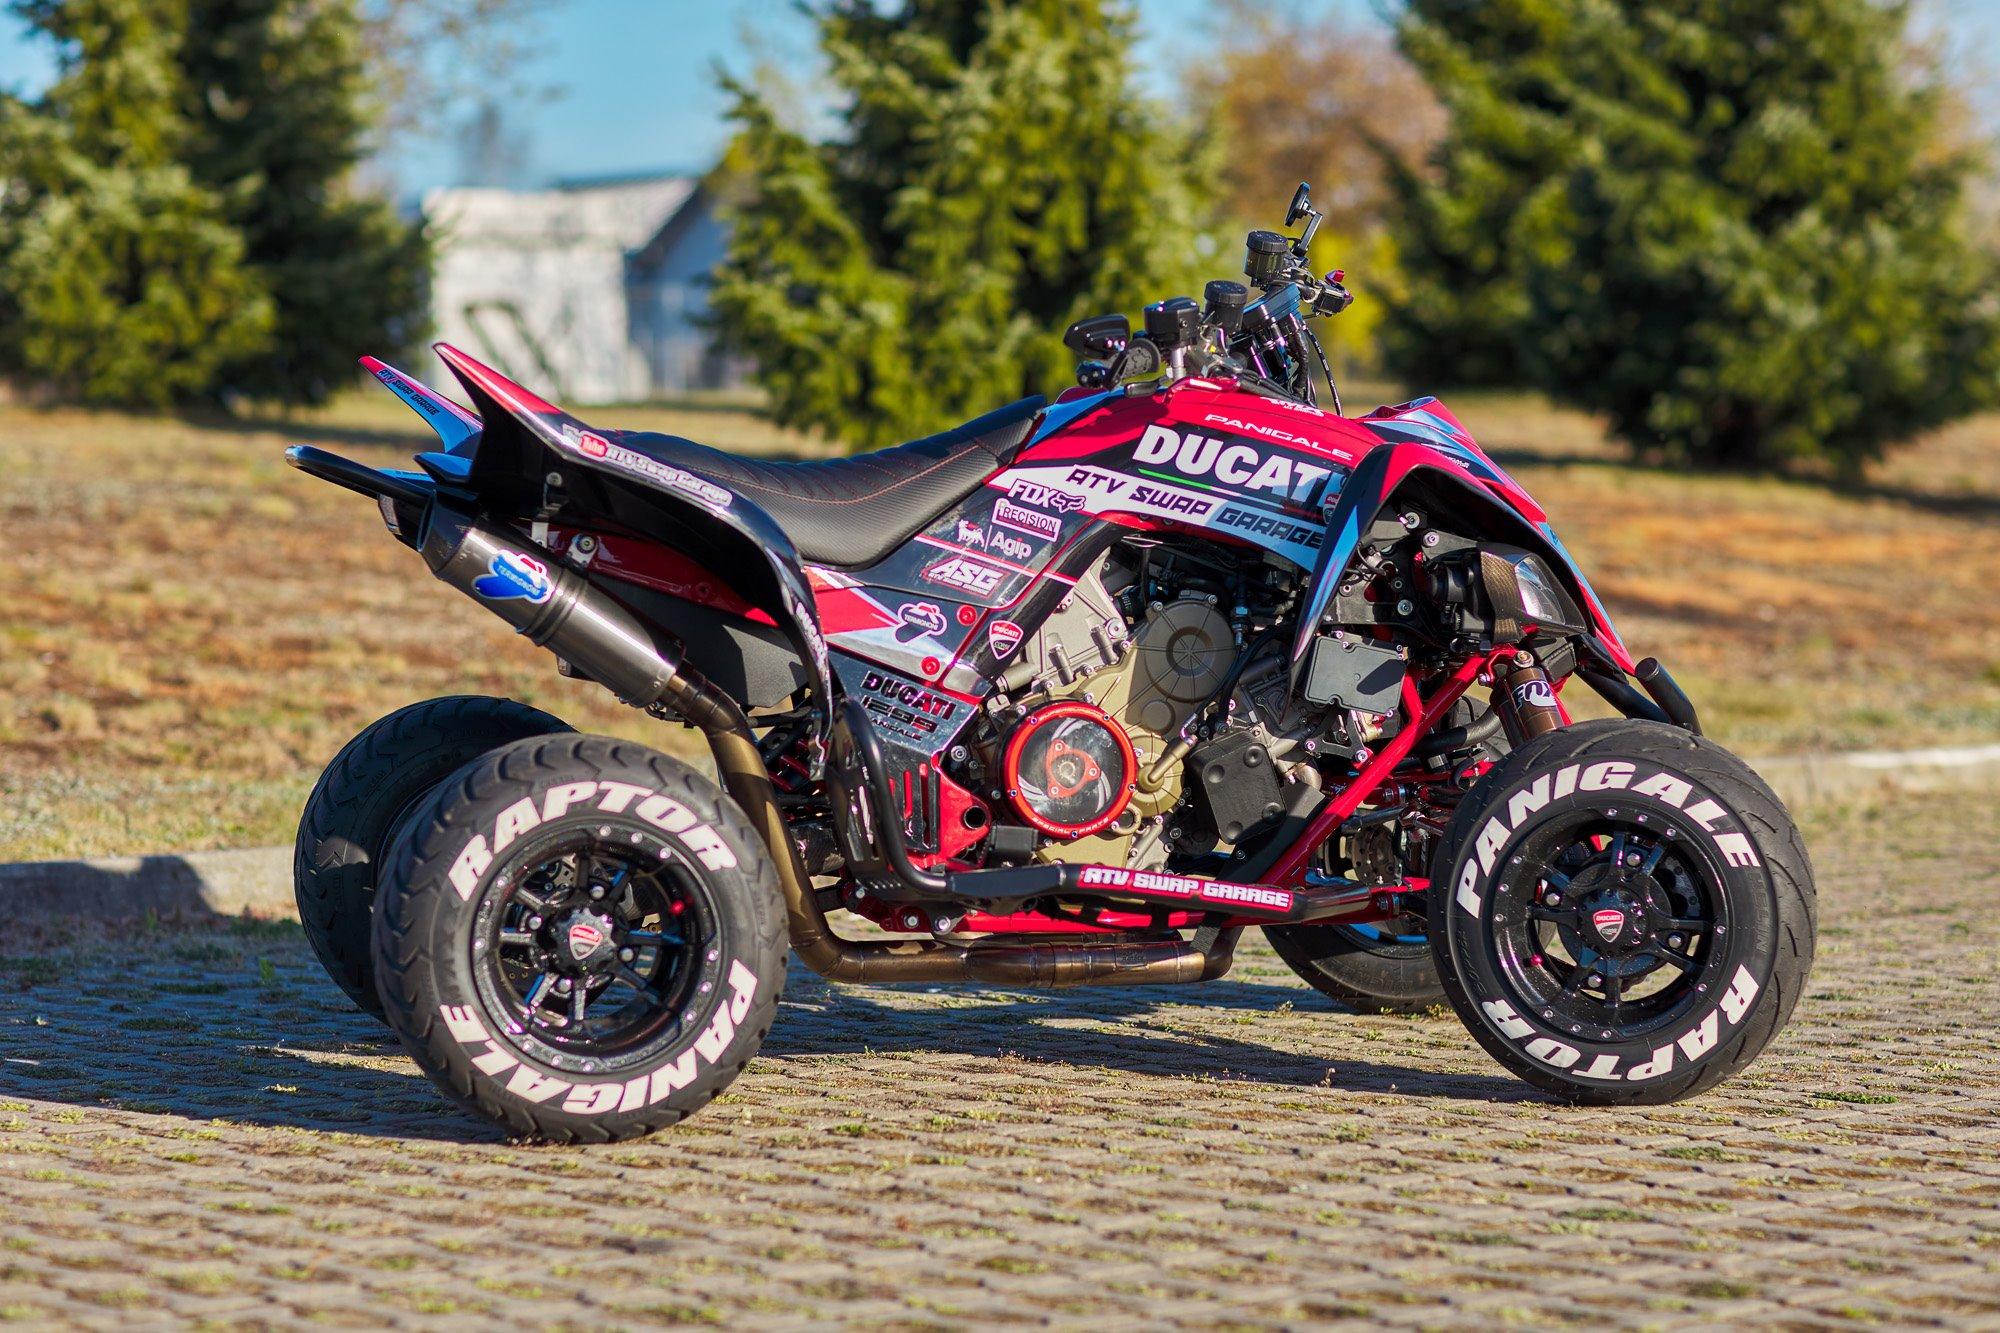 Yamaha Raptor with a Ducati Panigale 1299 V-Twin Motor